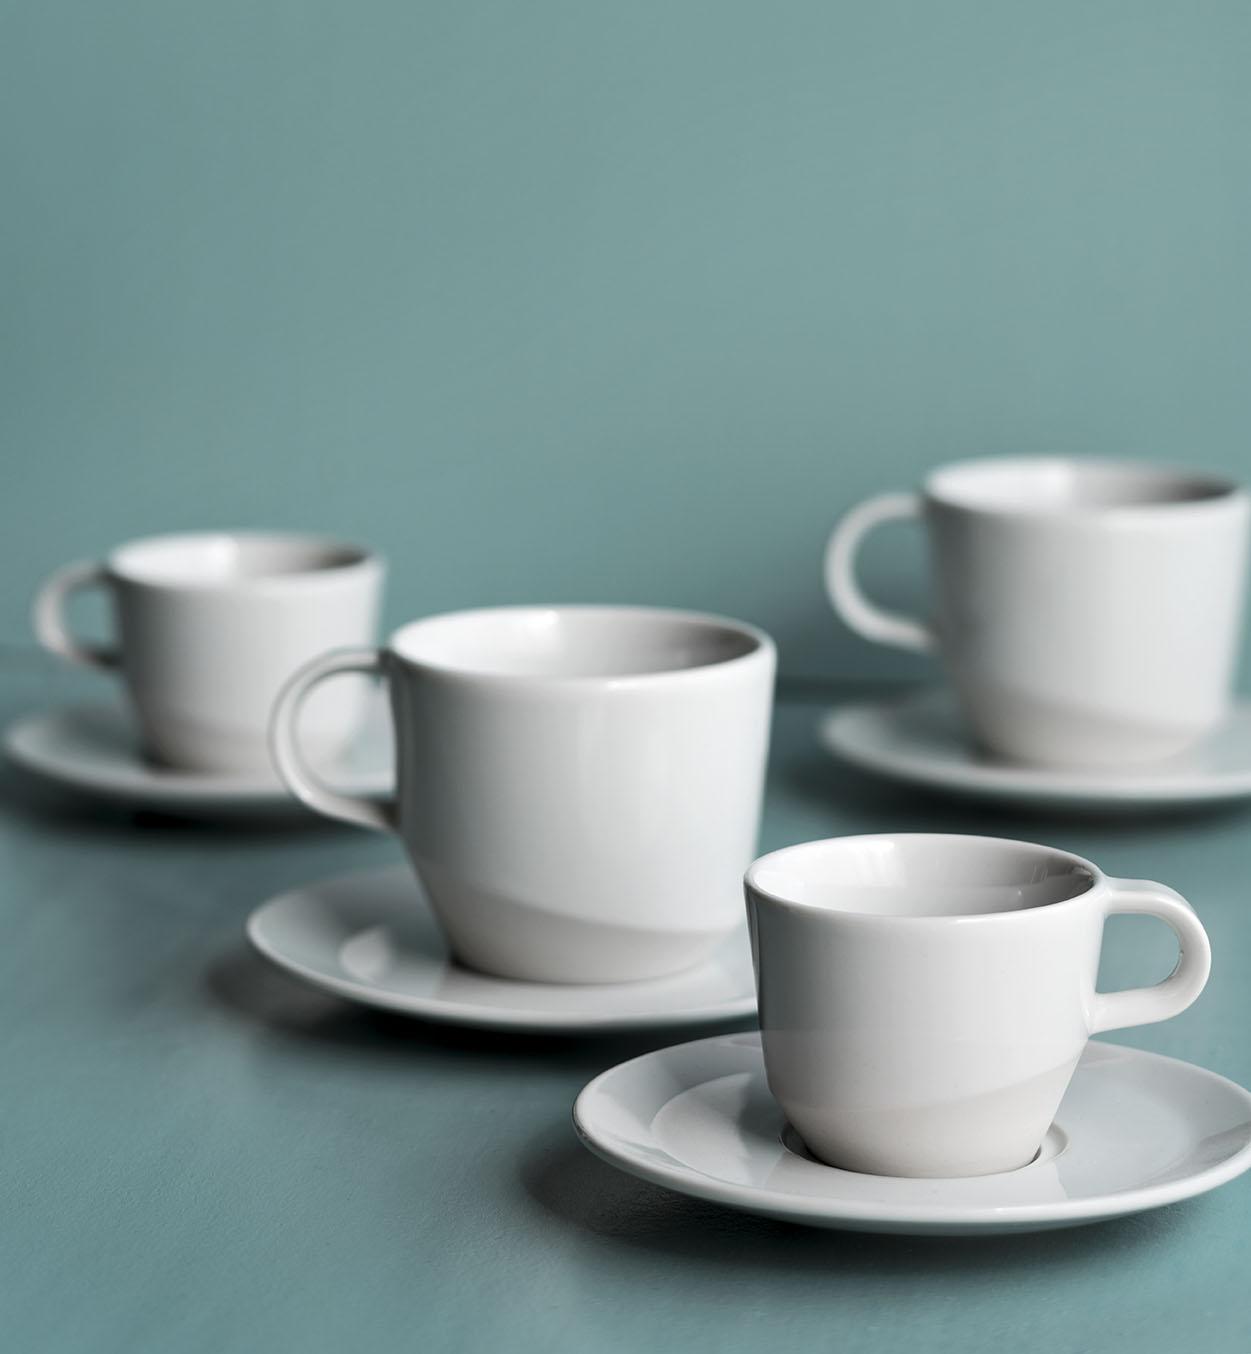 Johan & Nyström cups by Jon Eliason Design. Photo: Brian Pedstrup.